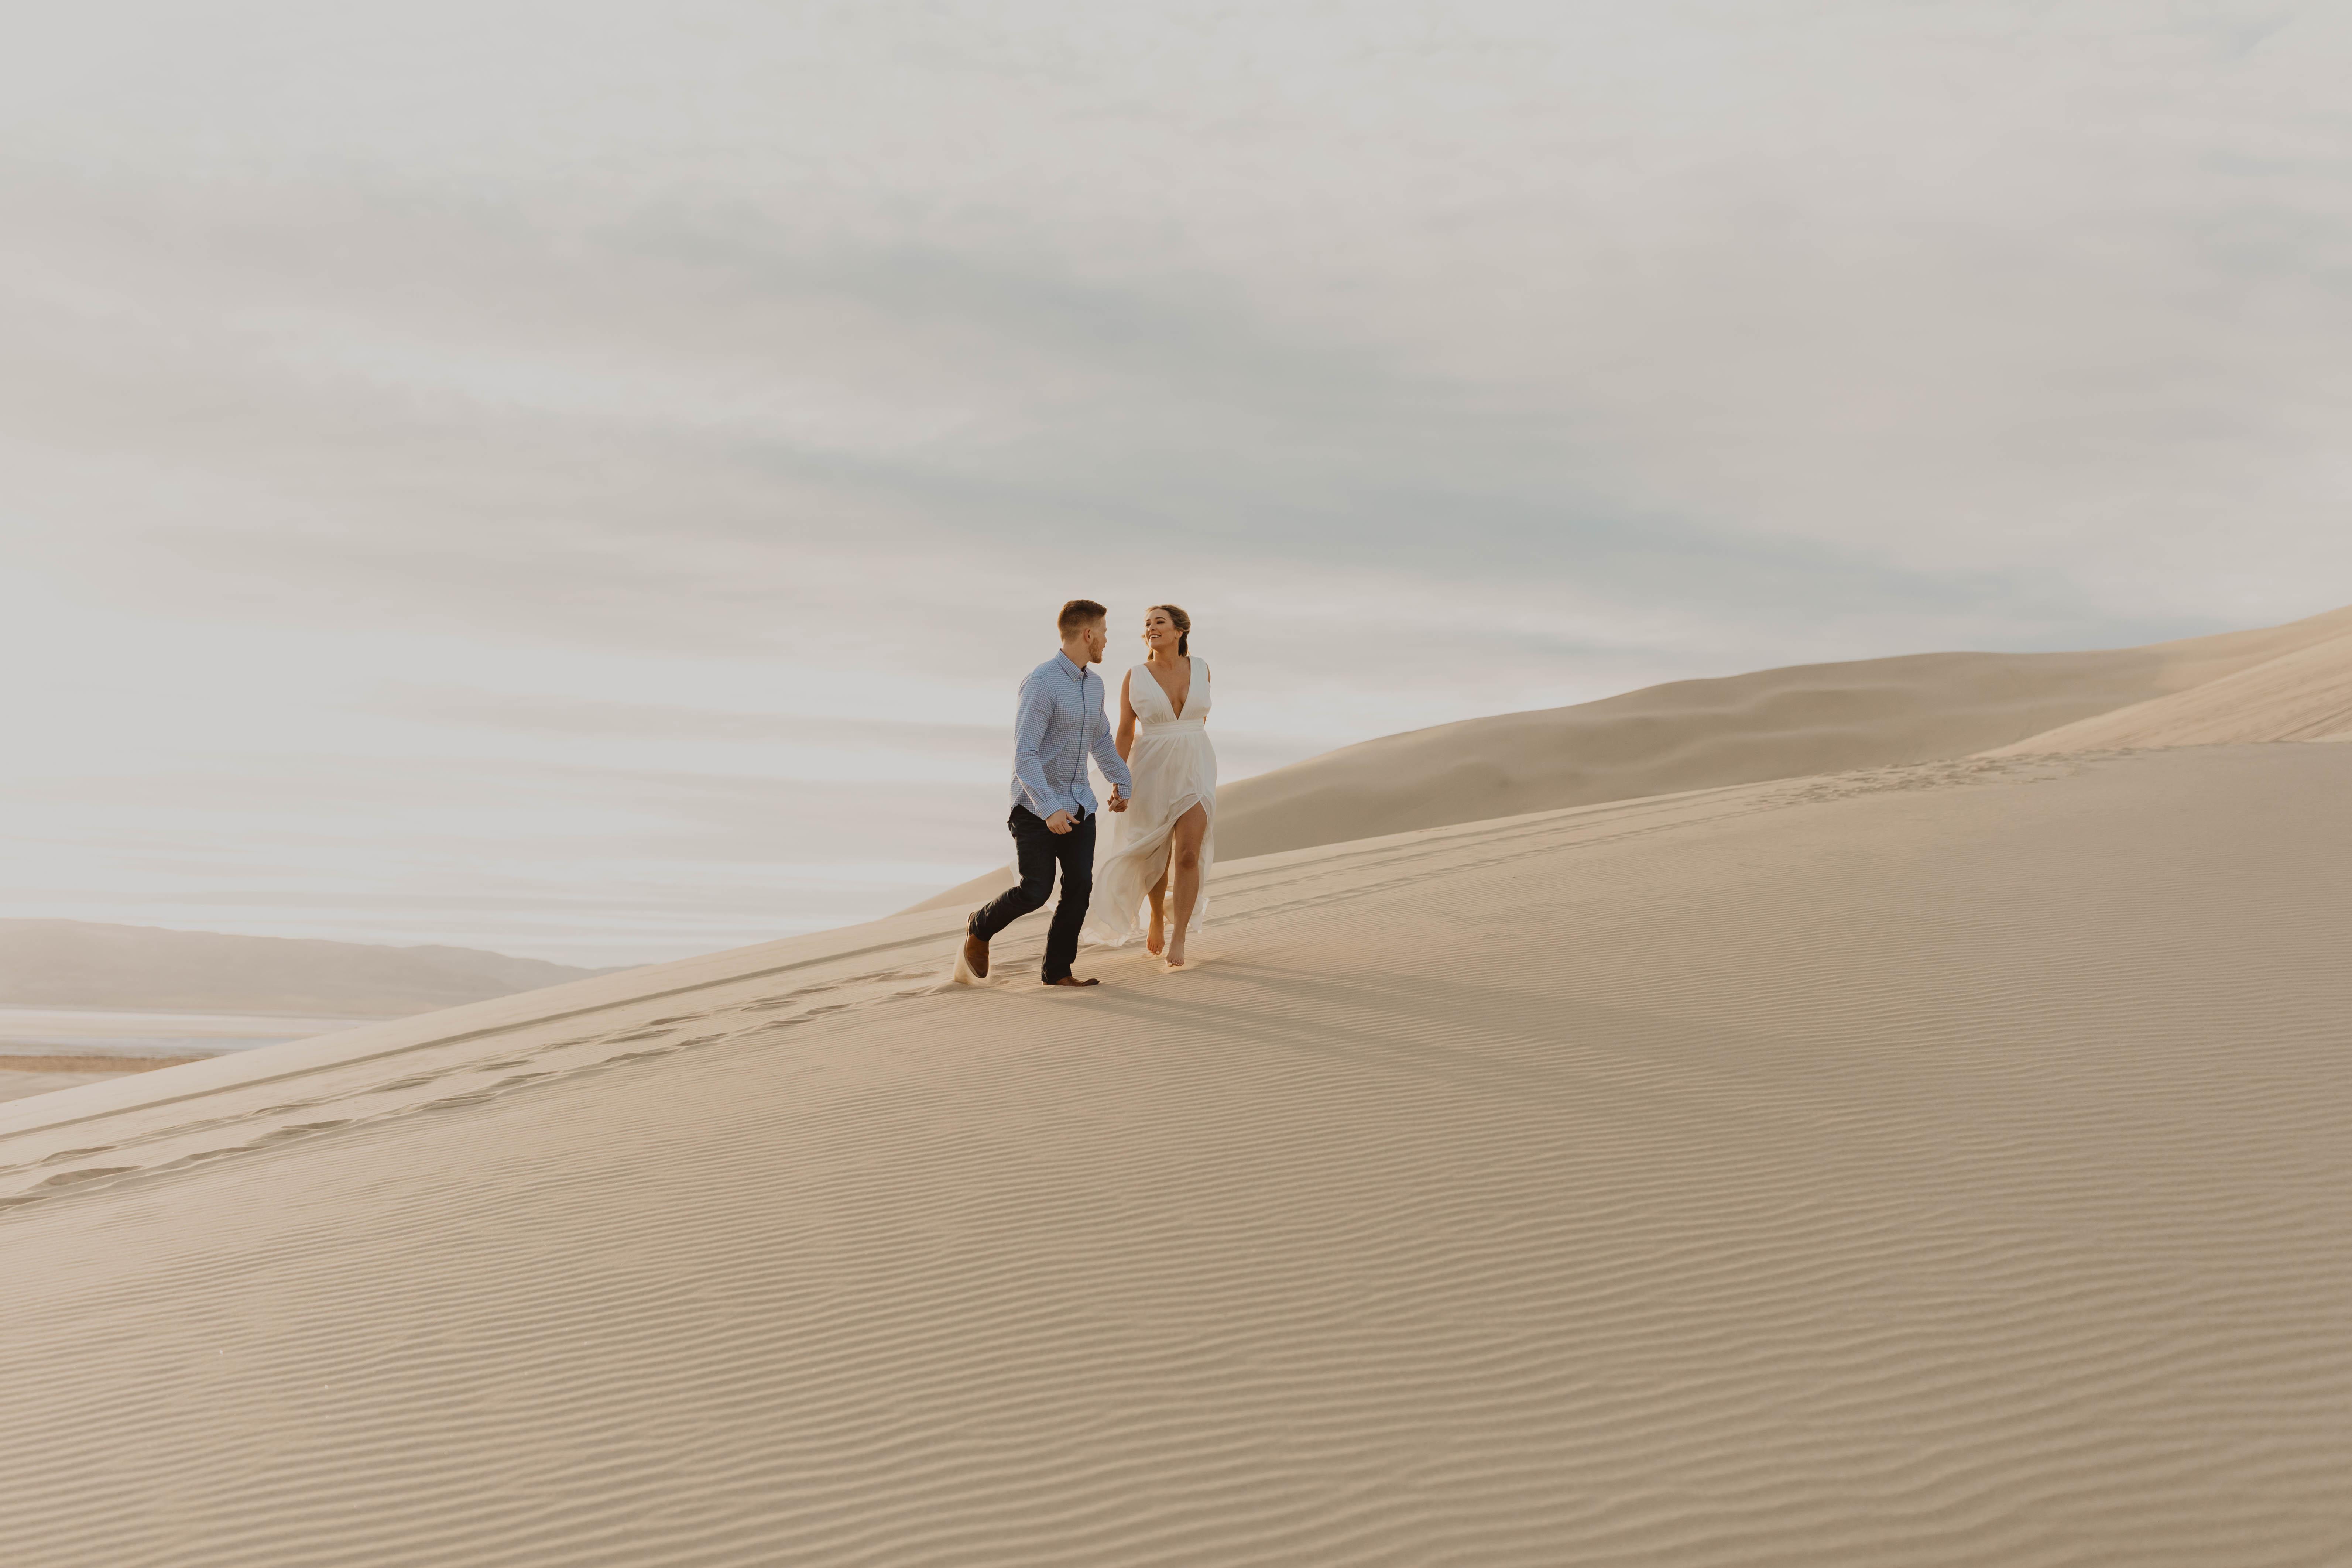 sand_dune_engagements